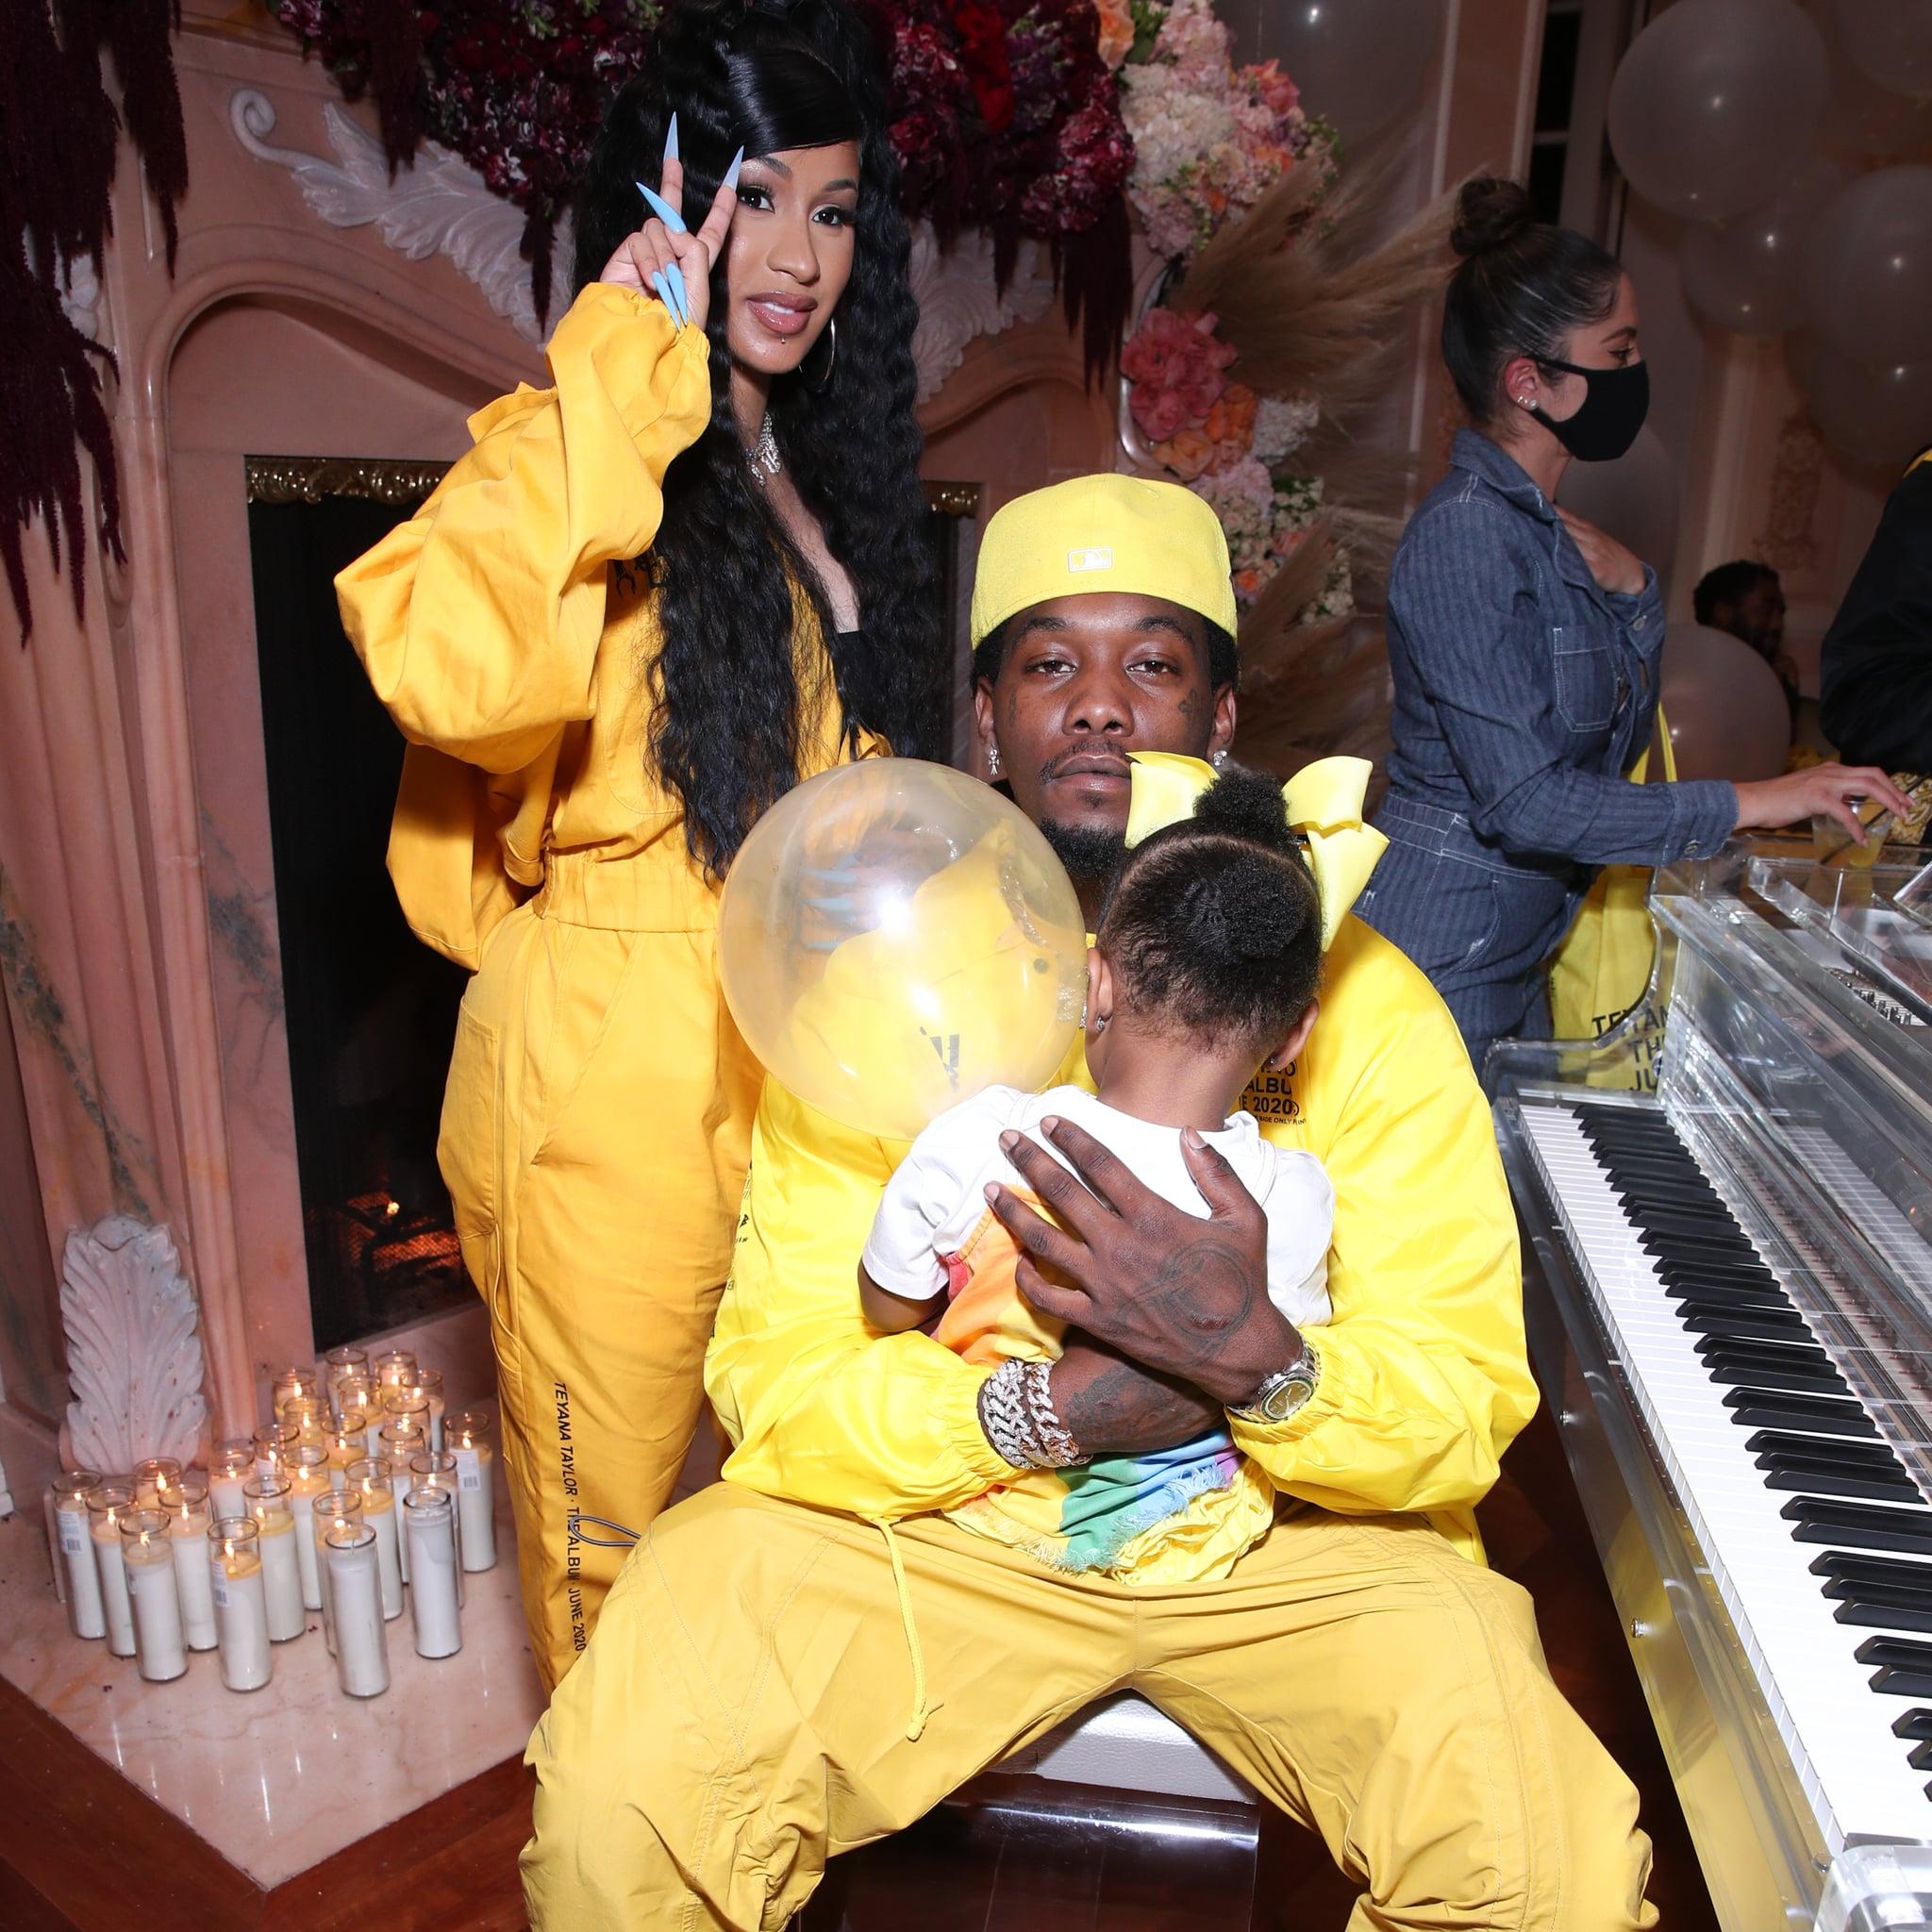 Cardi B Offset Dad to 5 Adorable Kids Glimpse inside the Rapper's Fatherhood!